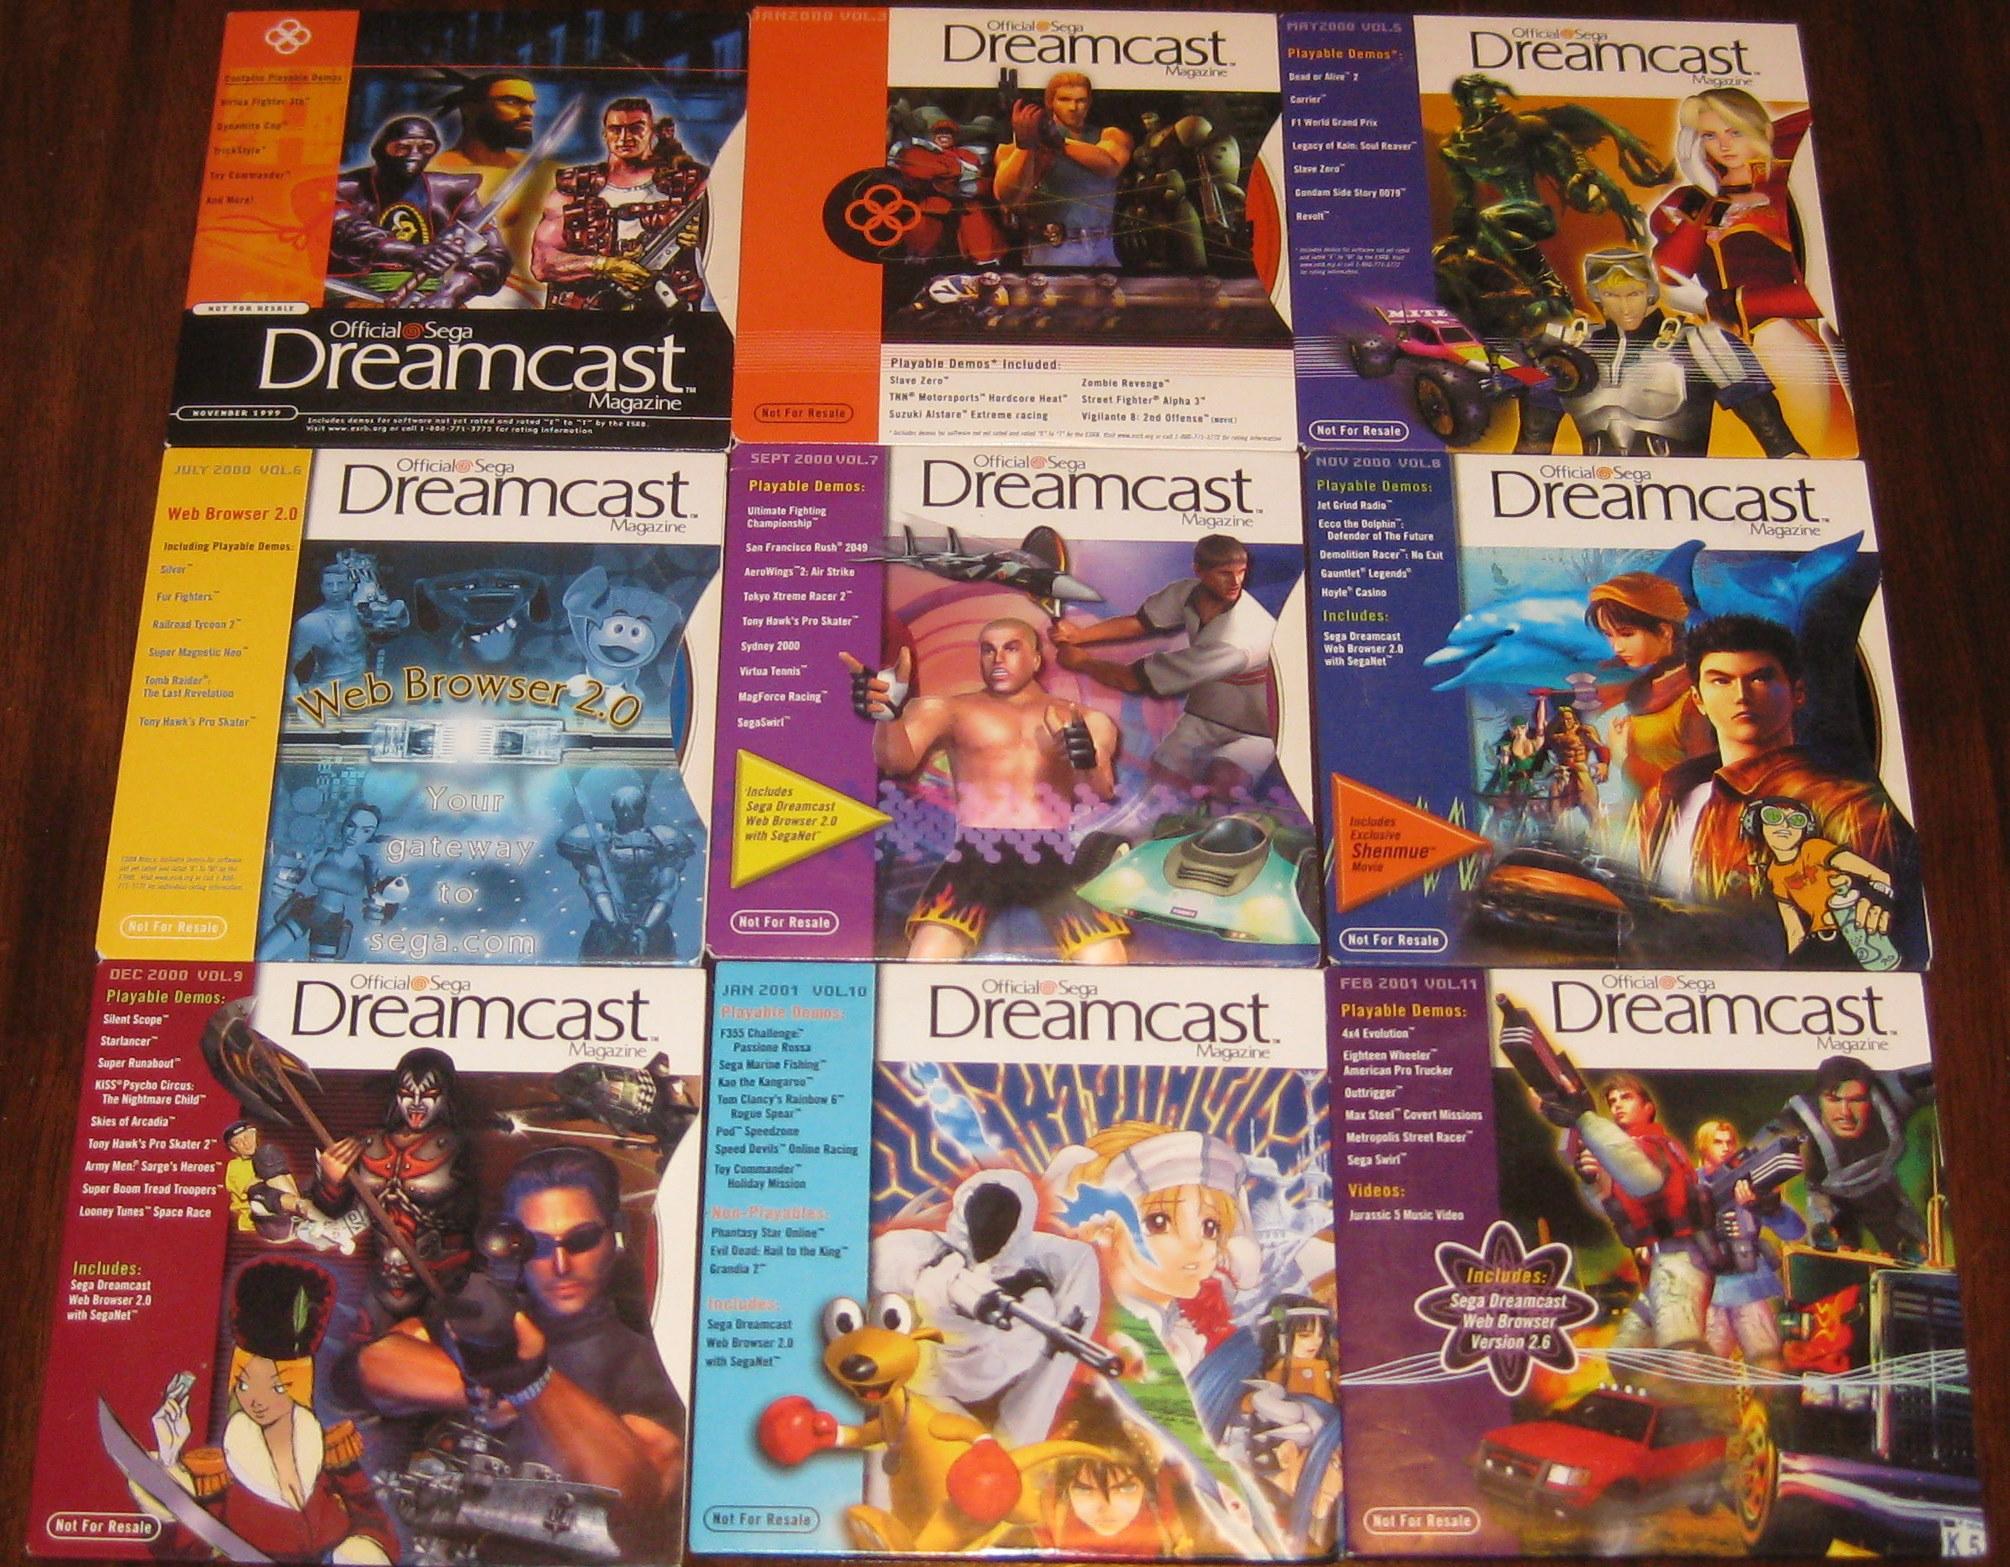 Sega dreamcast games list racketboy com view topic what games